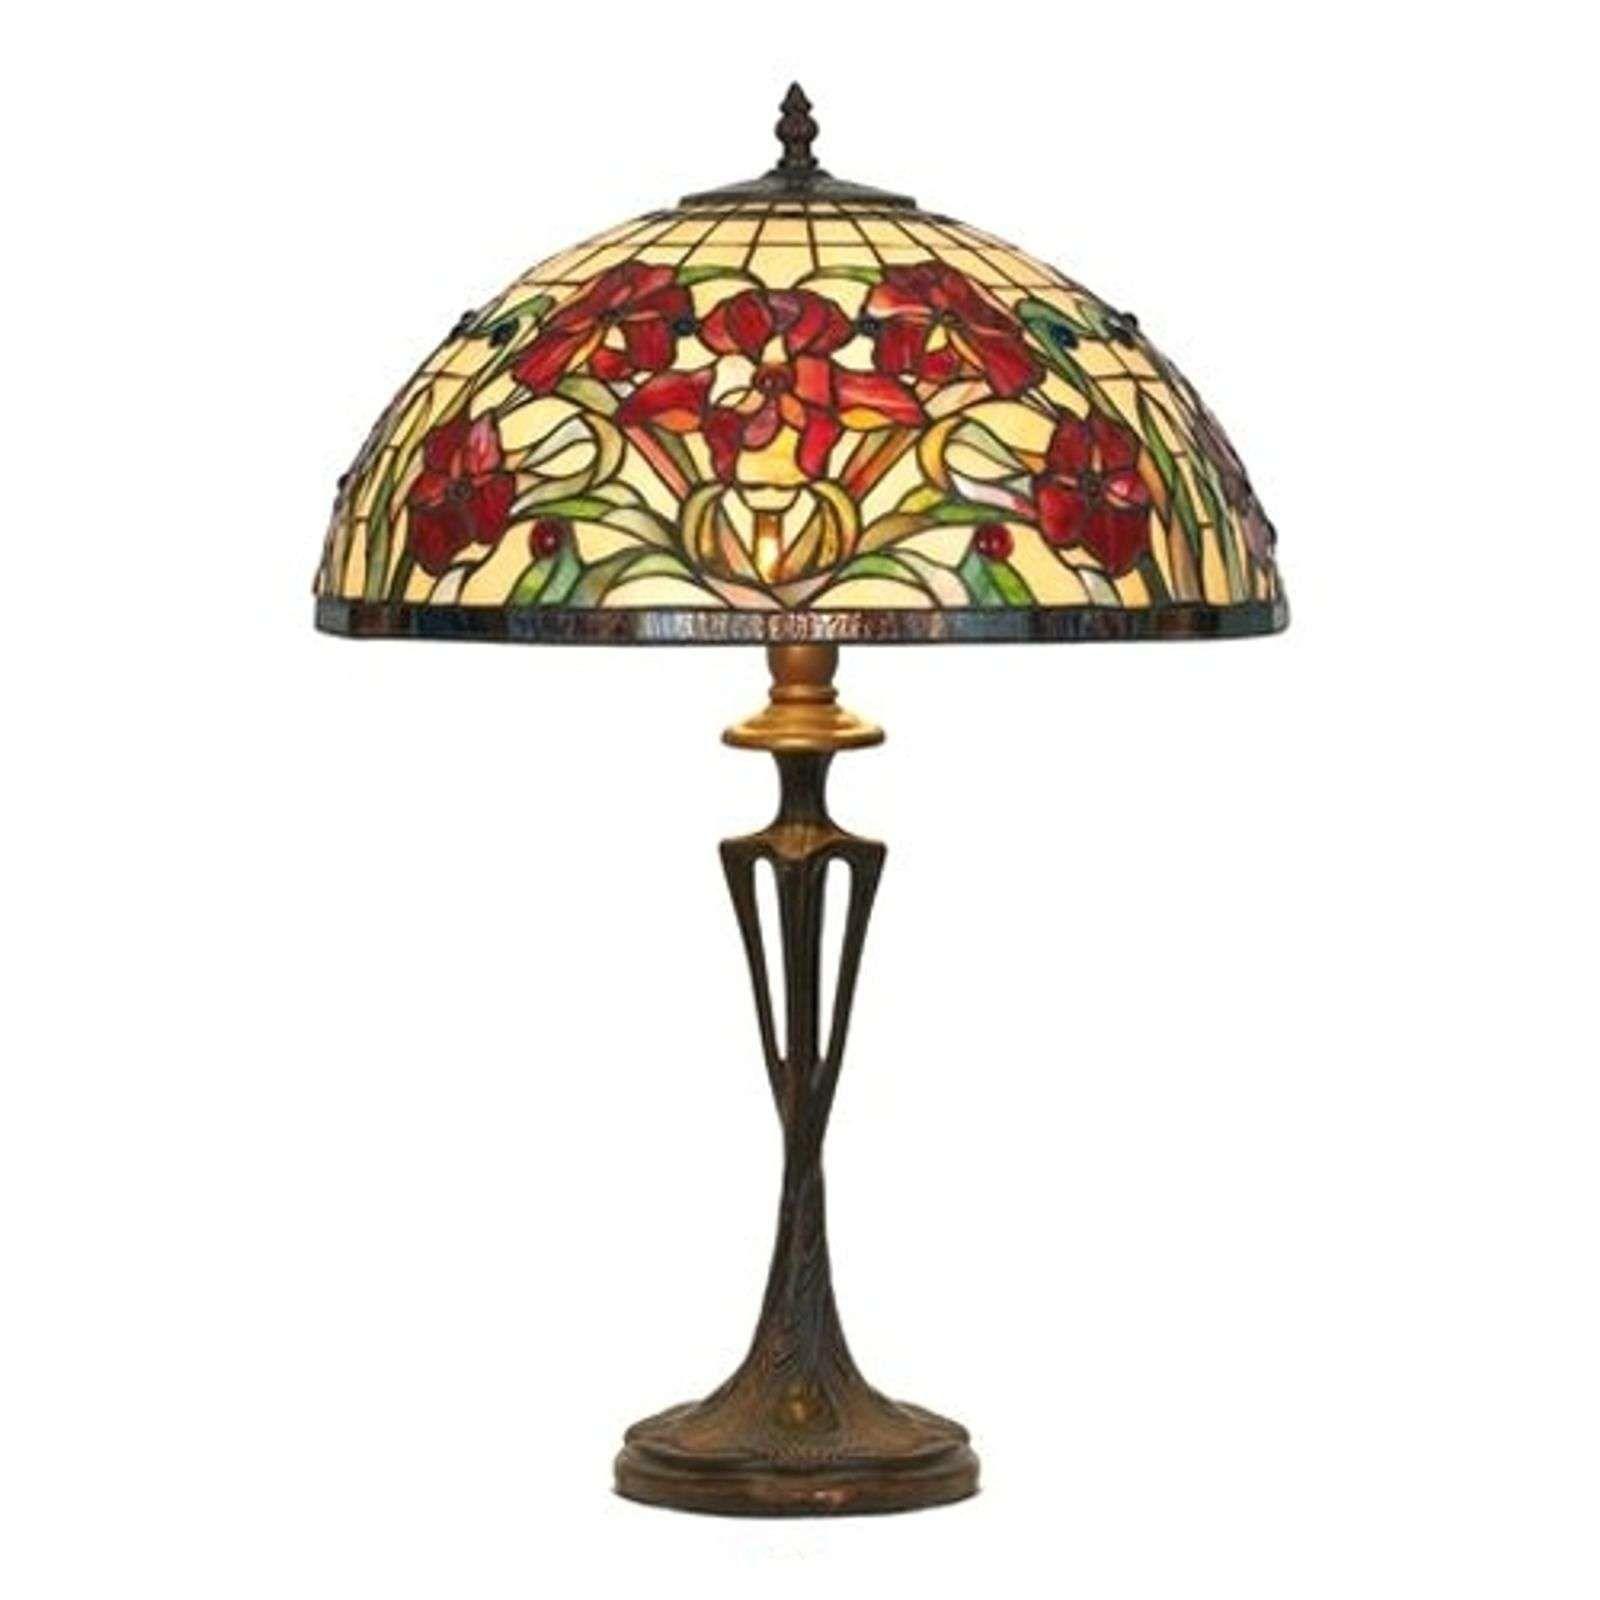 Tischleuchte Eline Im Tiffany Stil En 2020 Lampes De Table Luminaire Lampe A Poser